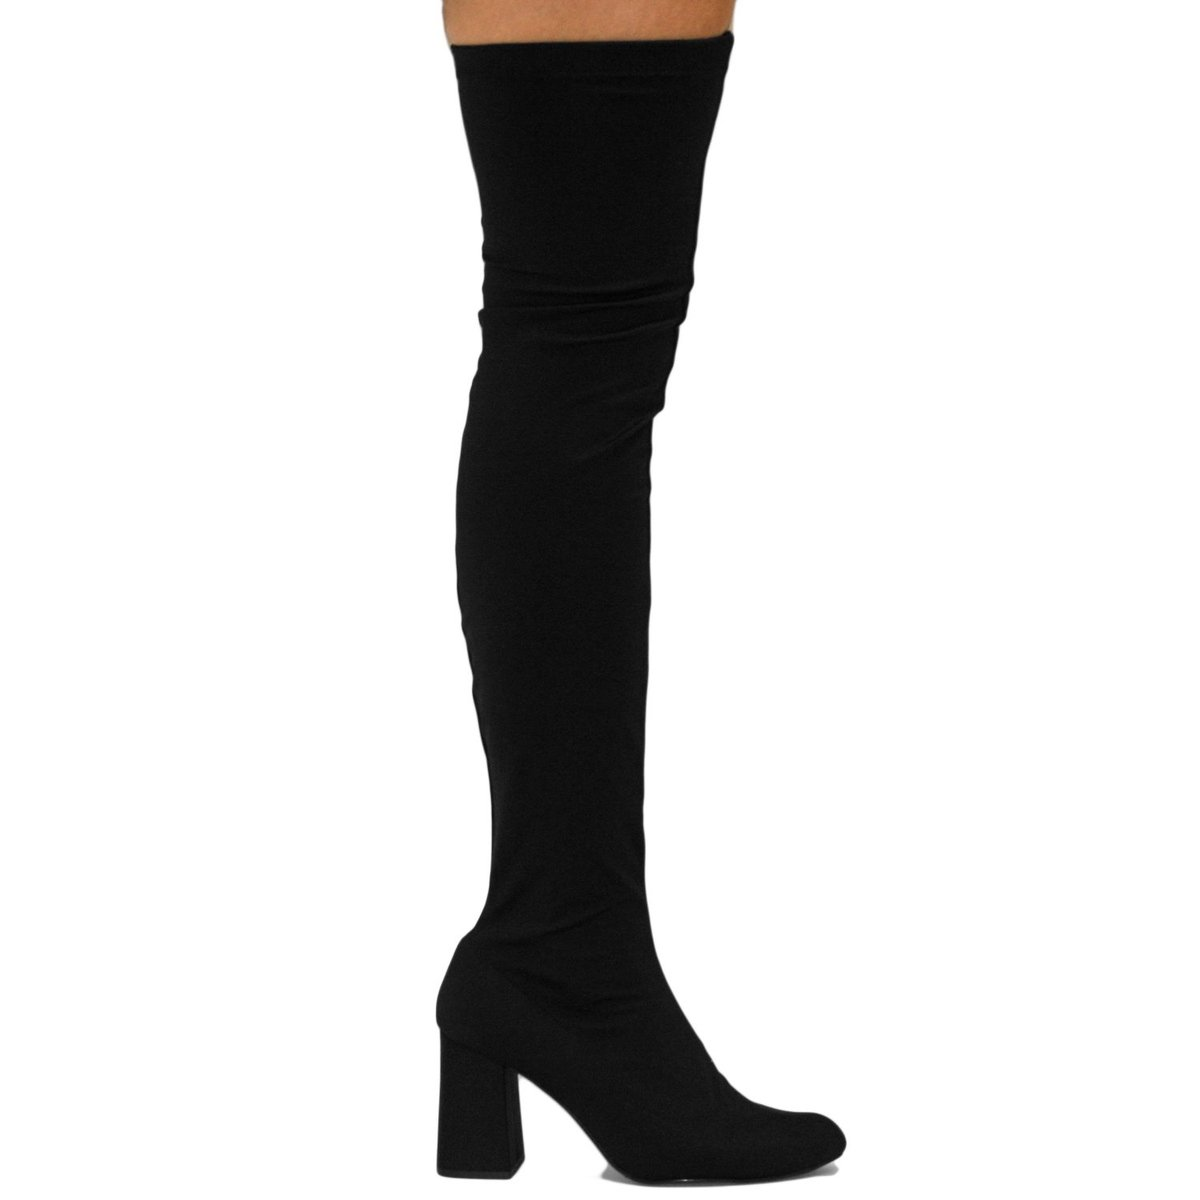 Bota Meia Liszy Over The Knee Feminina - Preto - Compre Agora  9aefabbff5385